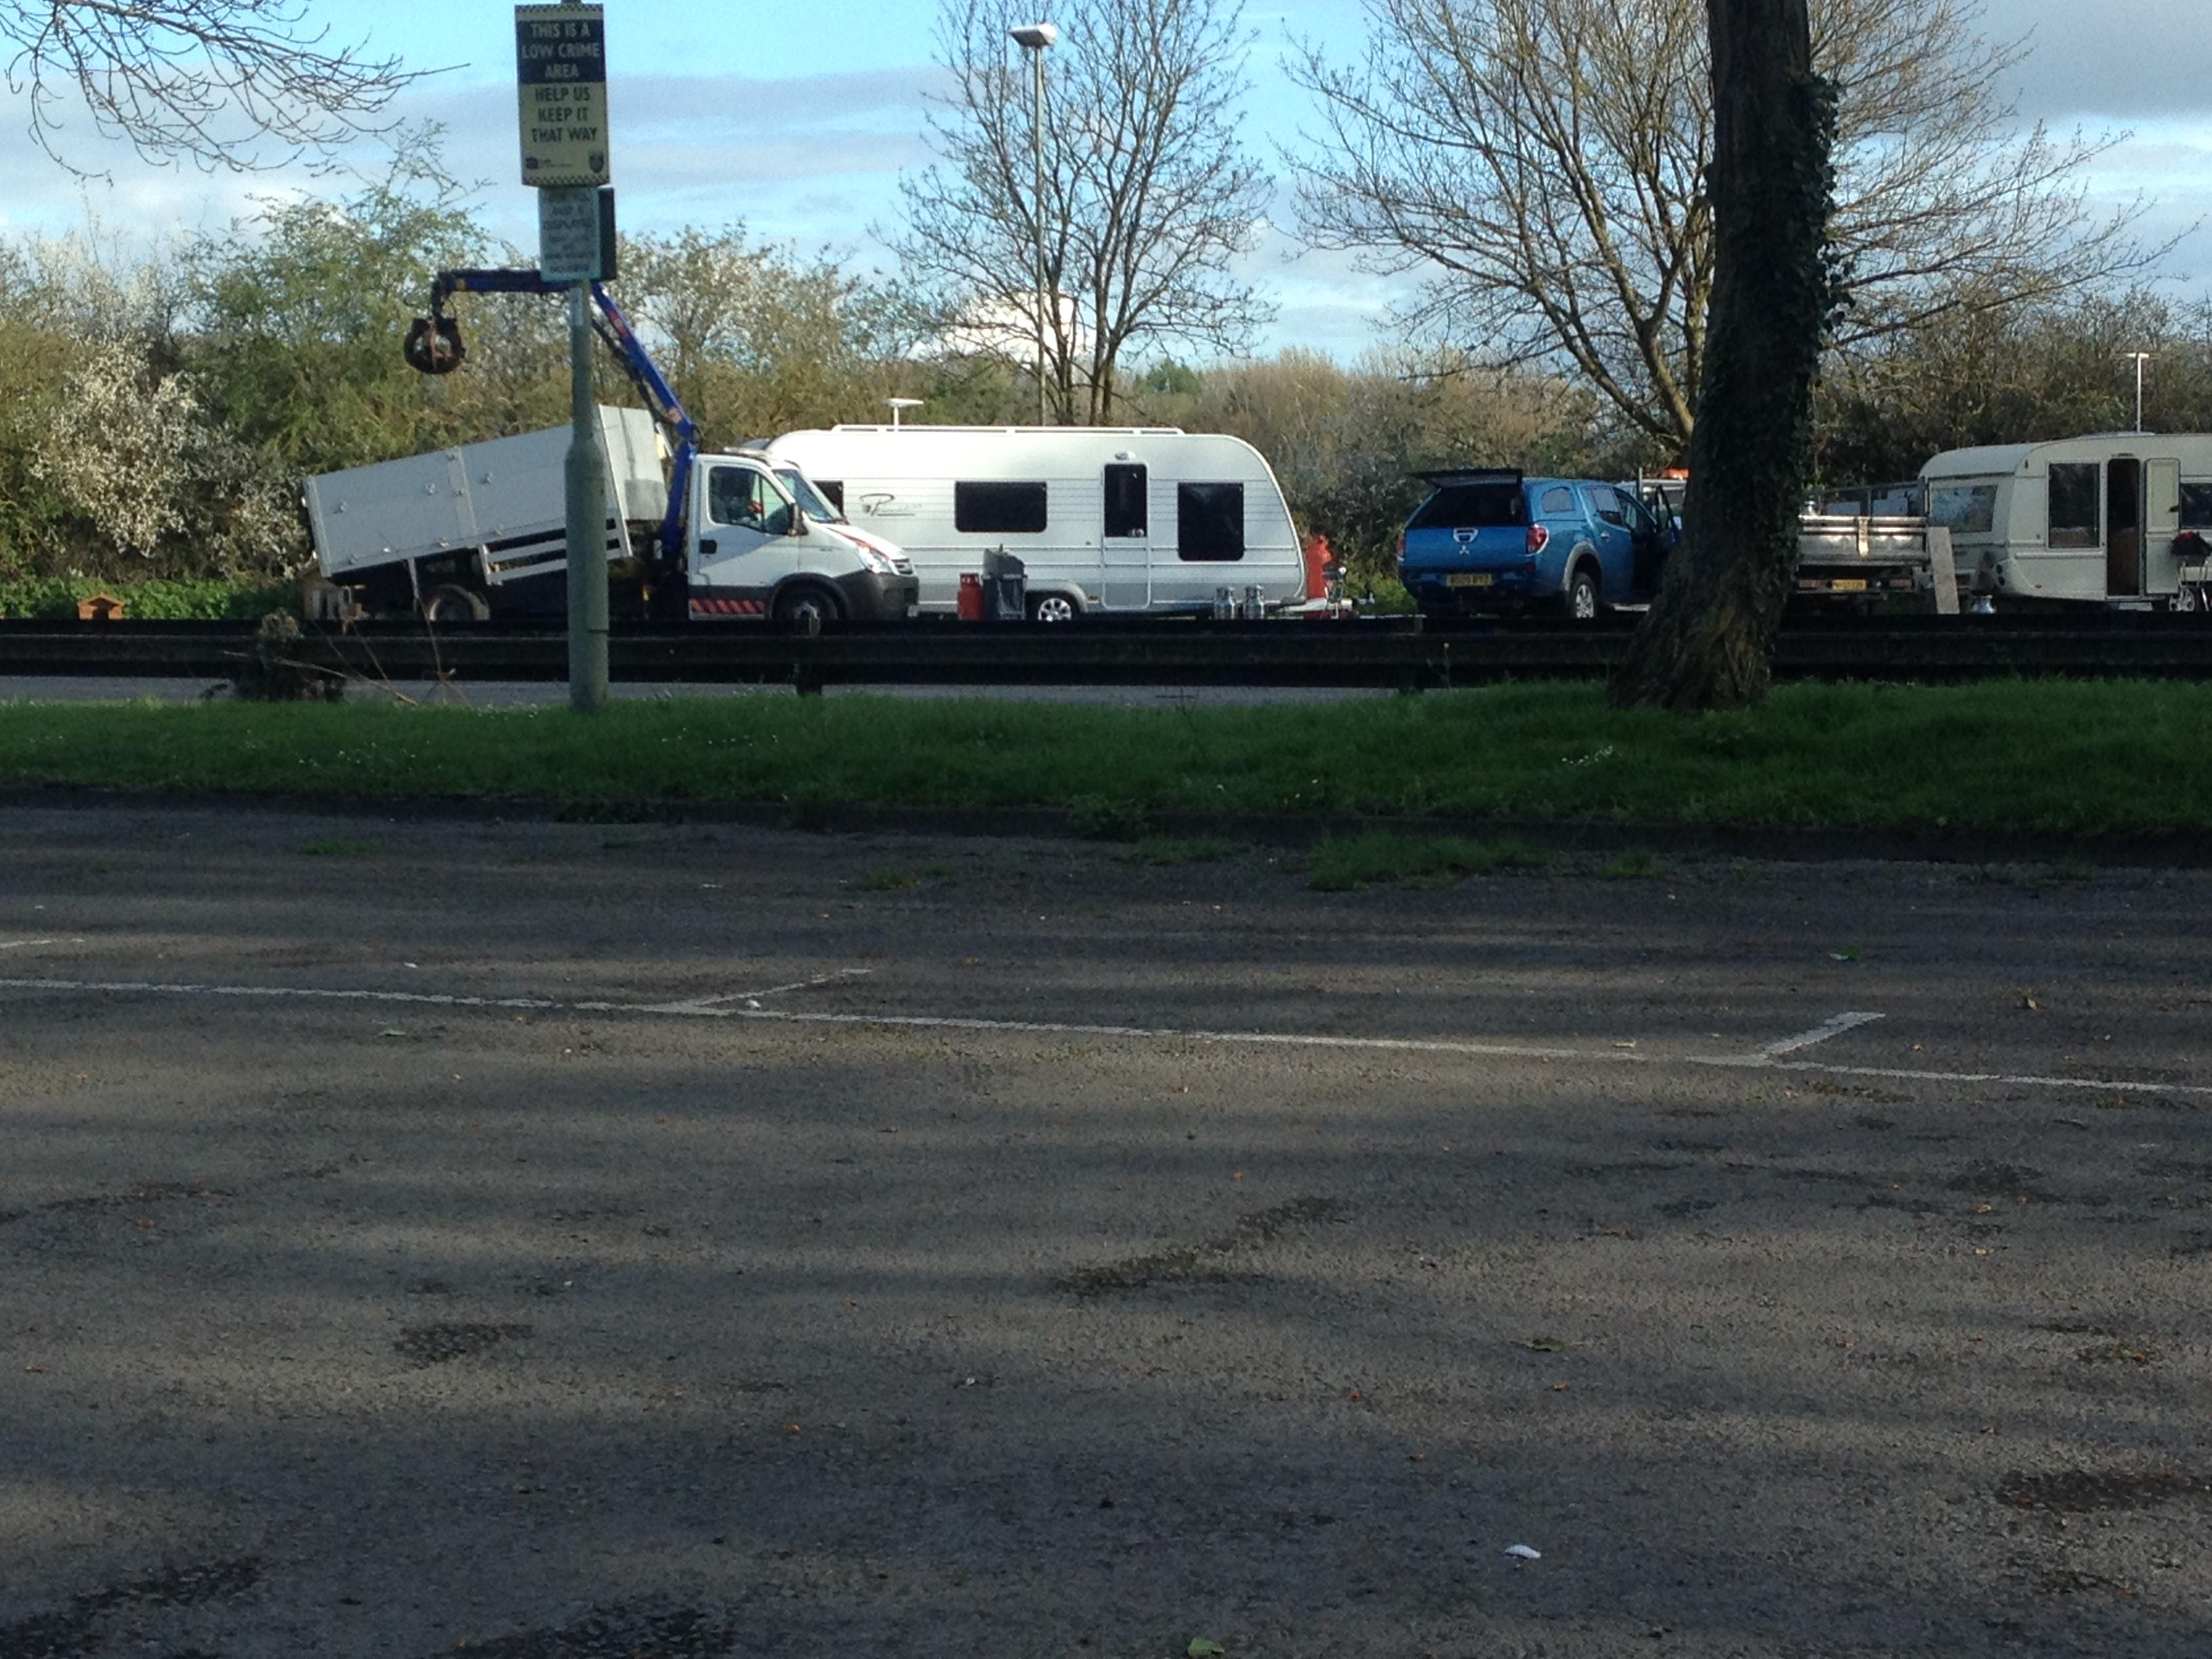 Rye Farm Car Park Abingdon